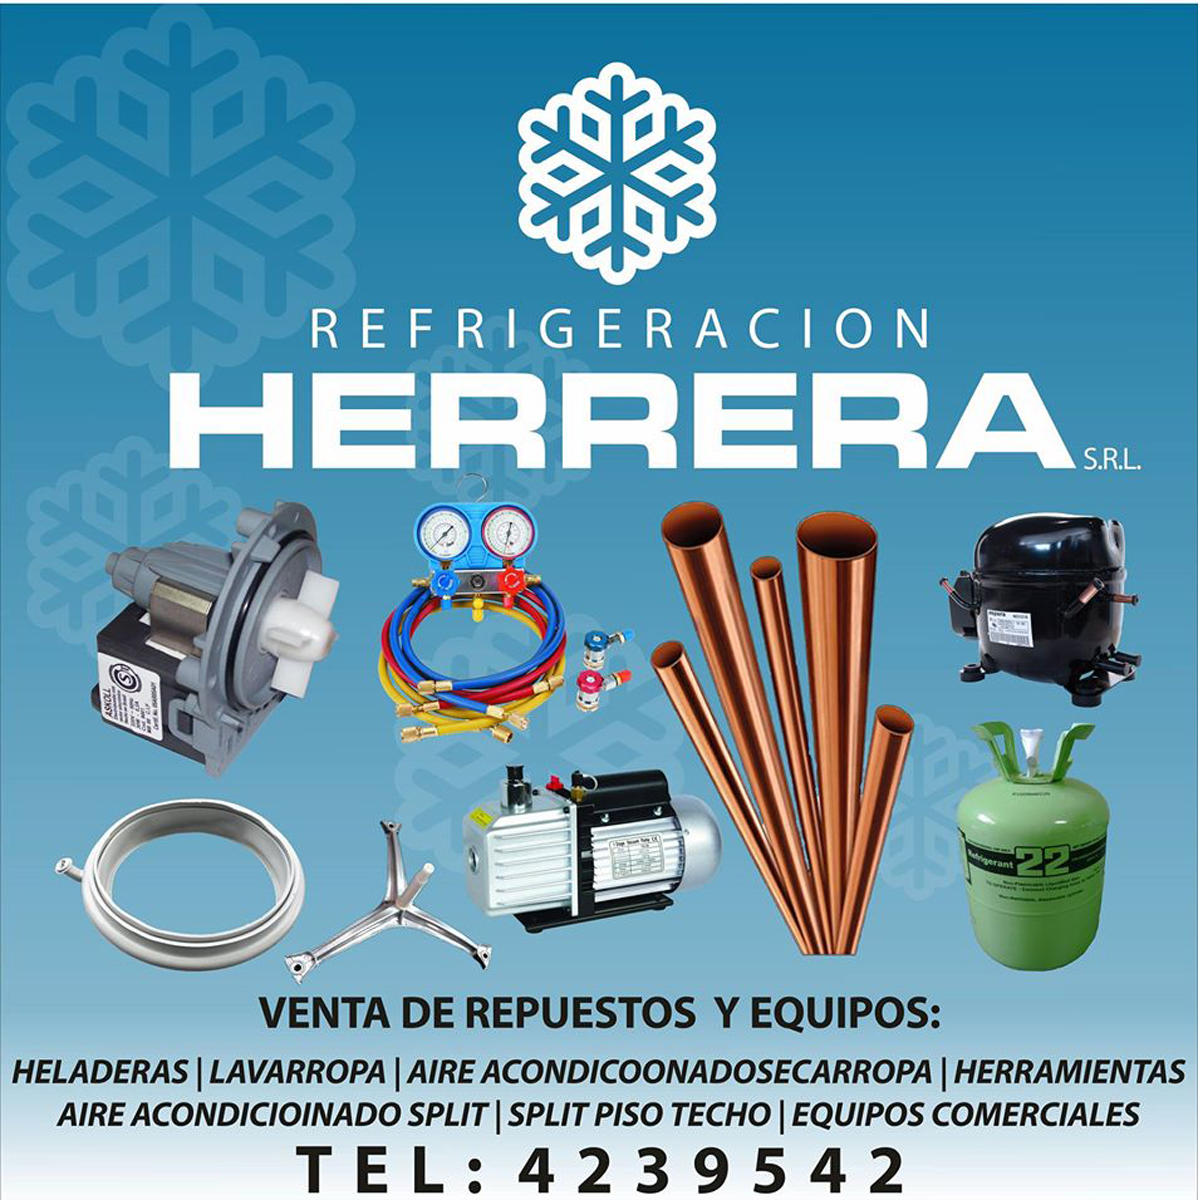 REFRIGERACION HERRERA